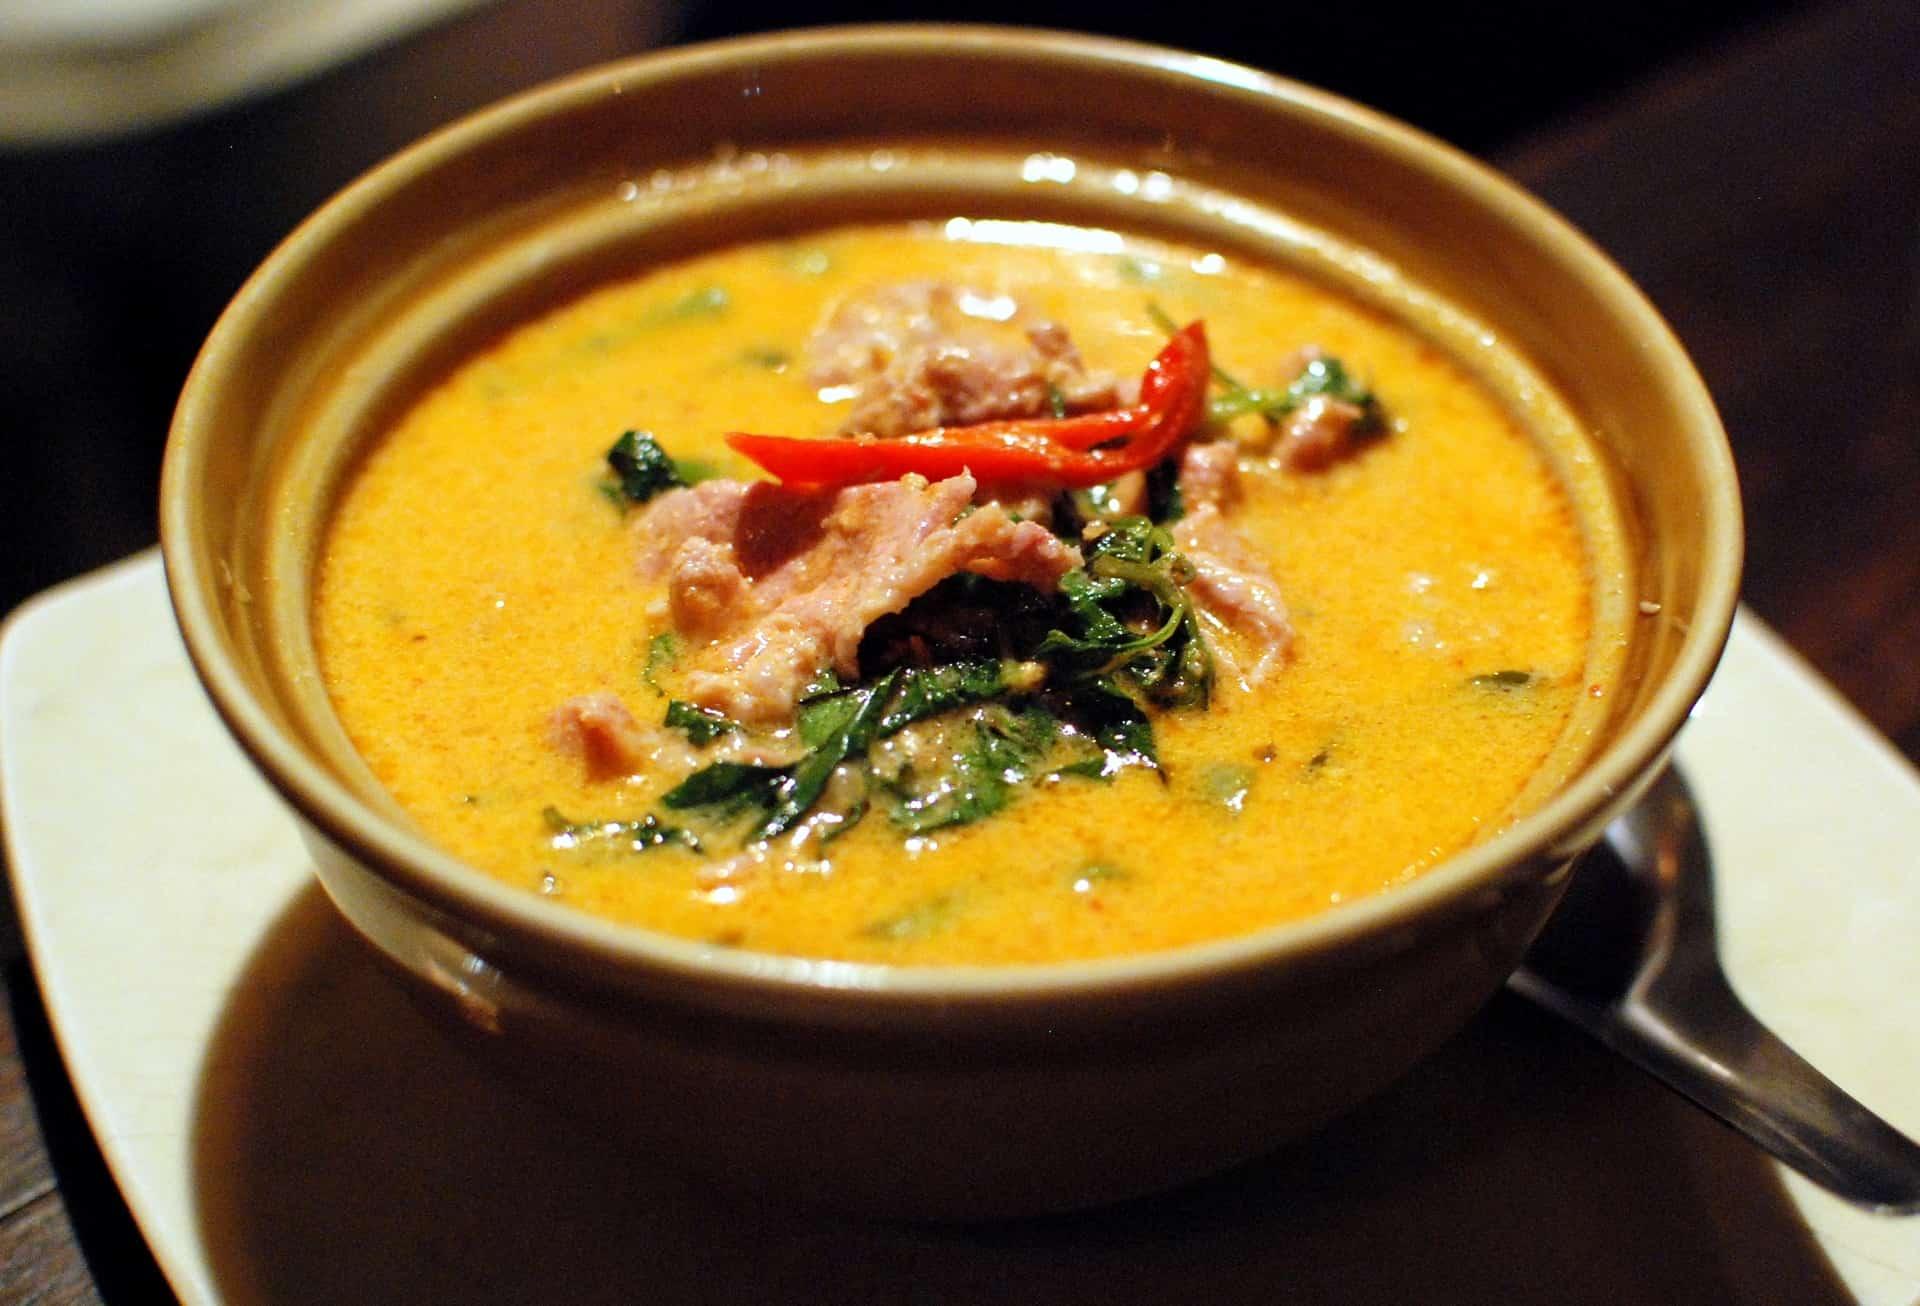 gambar makanan khas thailand Khaeng Phet